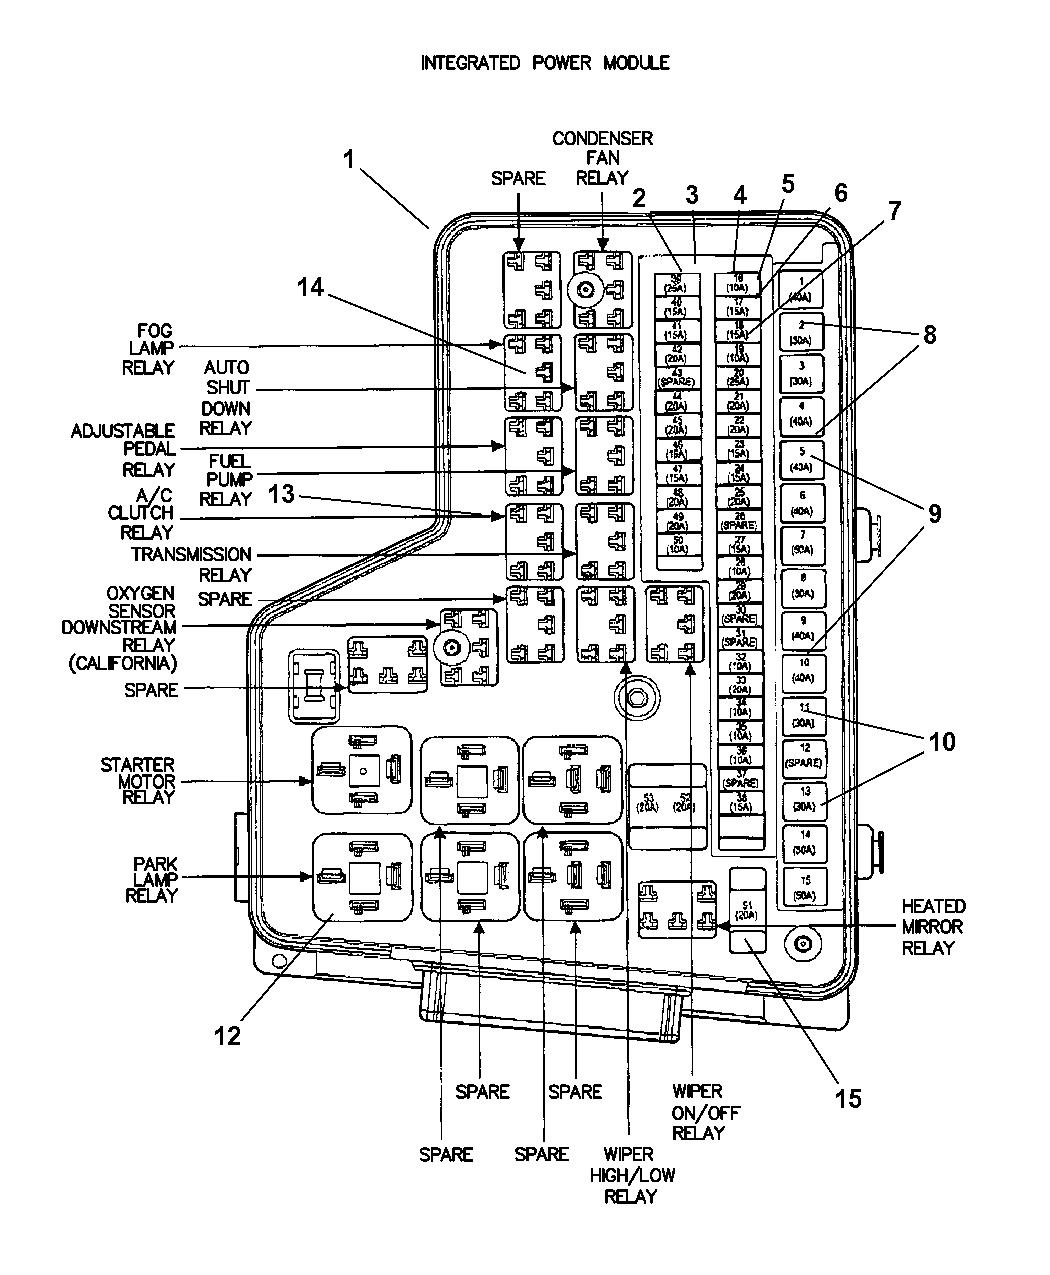 2010 dodge ram 2500 wiring diagram 719364 2010 dodge ram 2500 fuse diagram wiring library  719364 2010 dodge ram 2500 fuse diagram